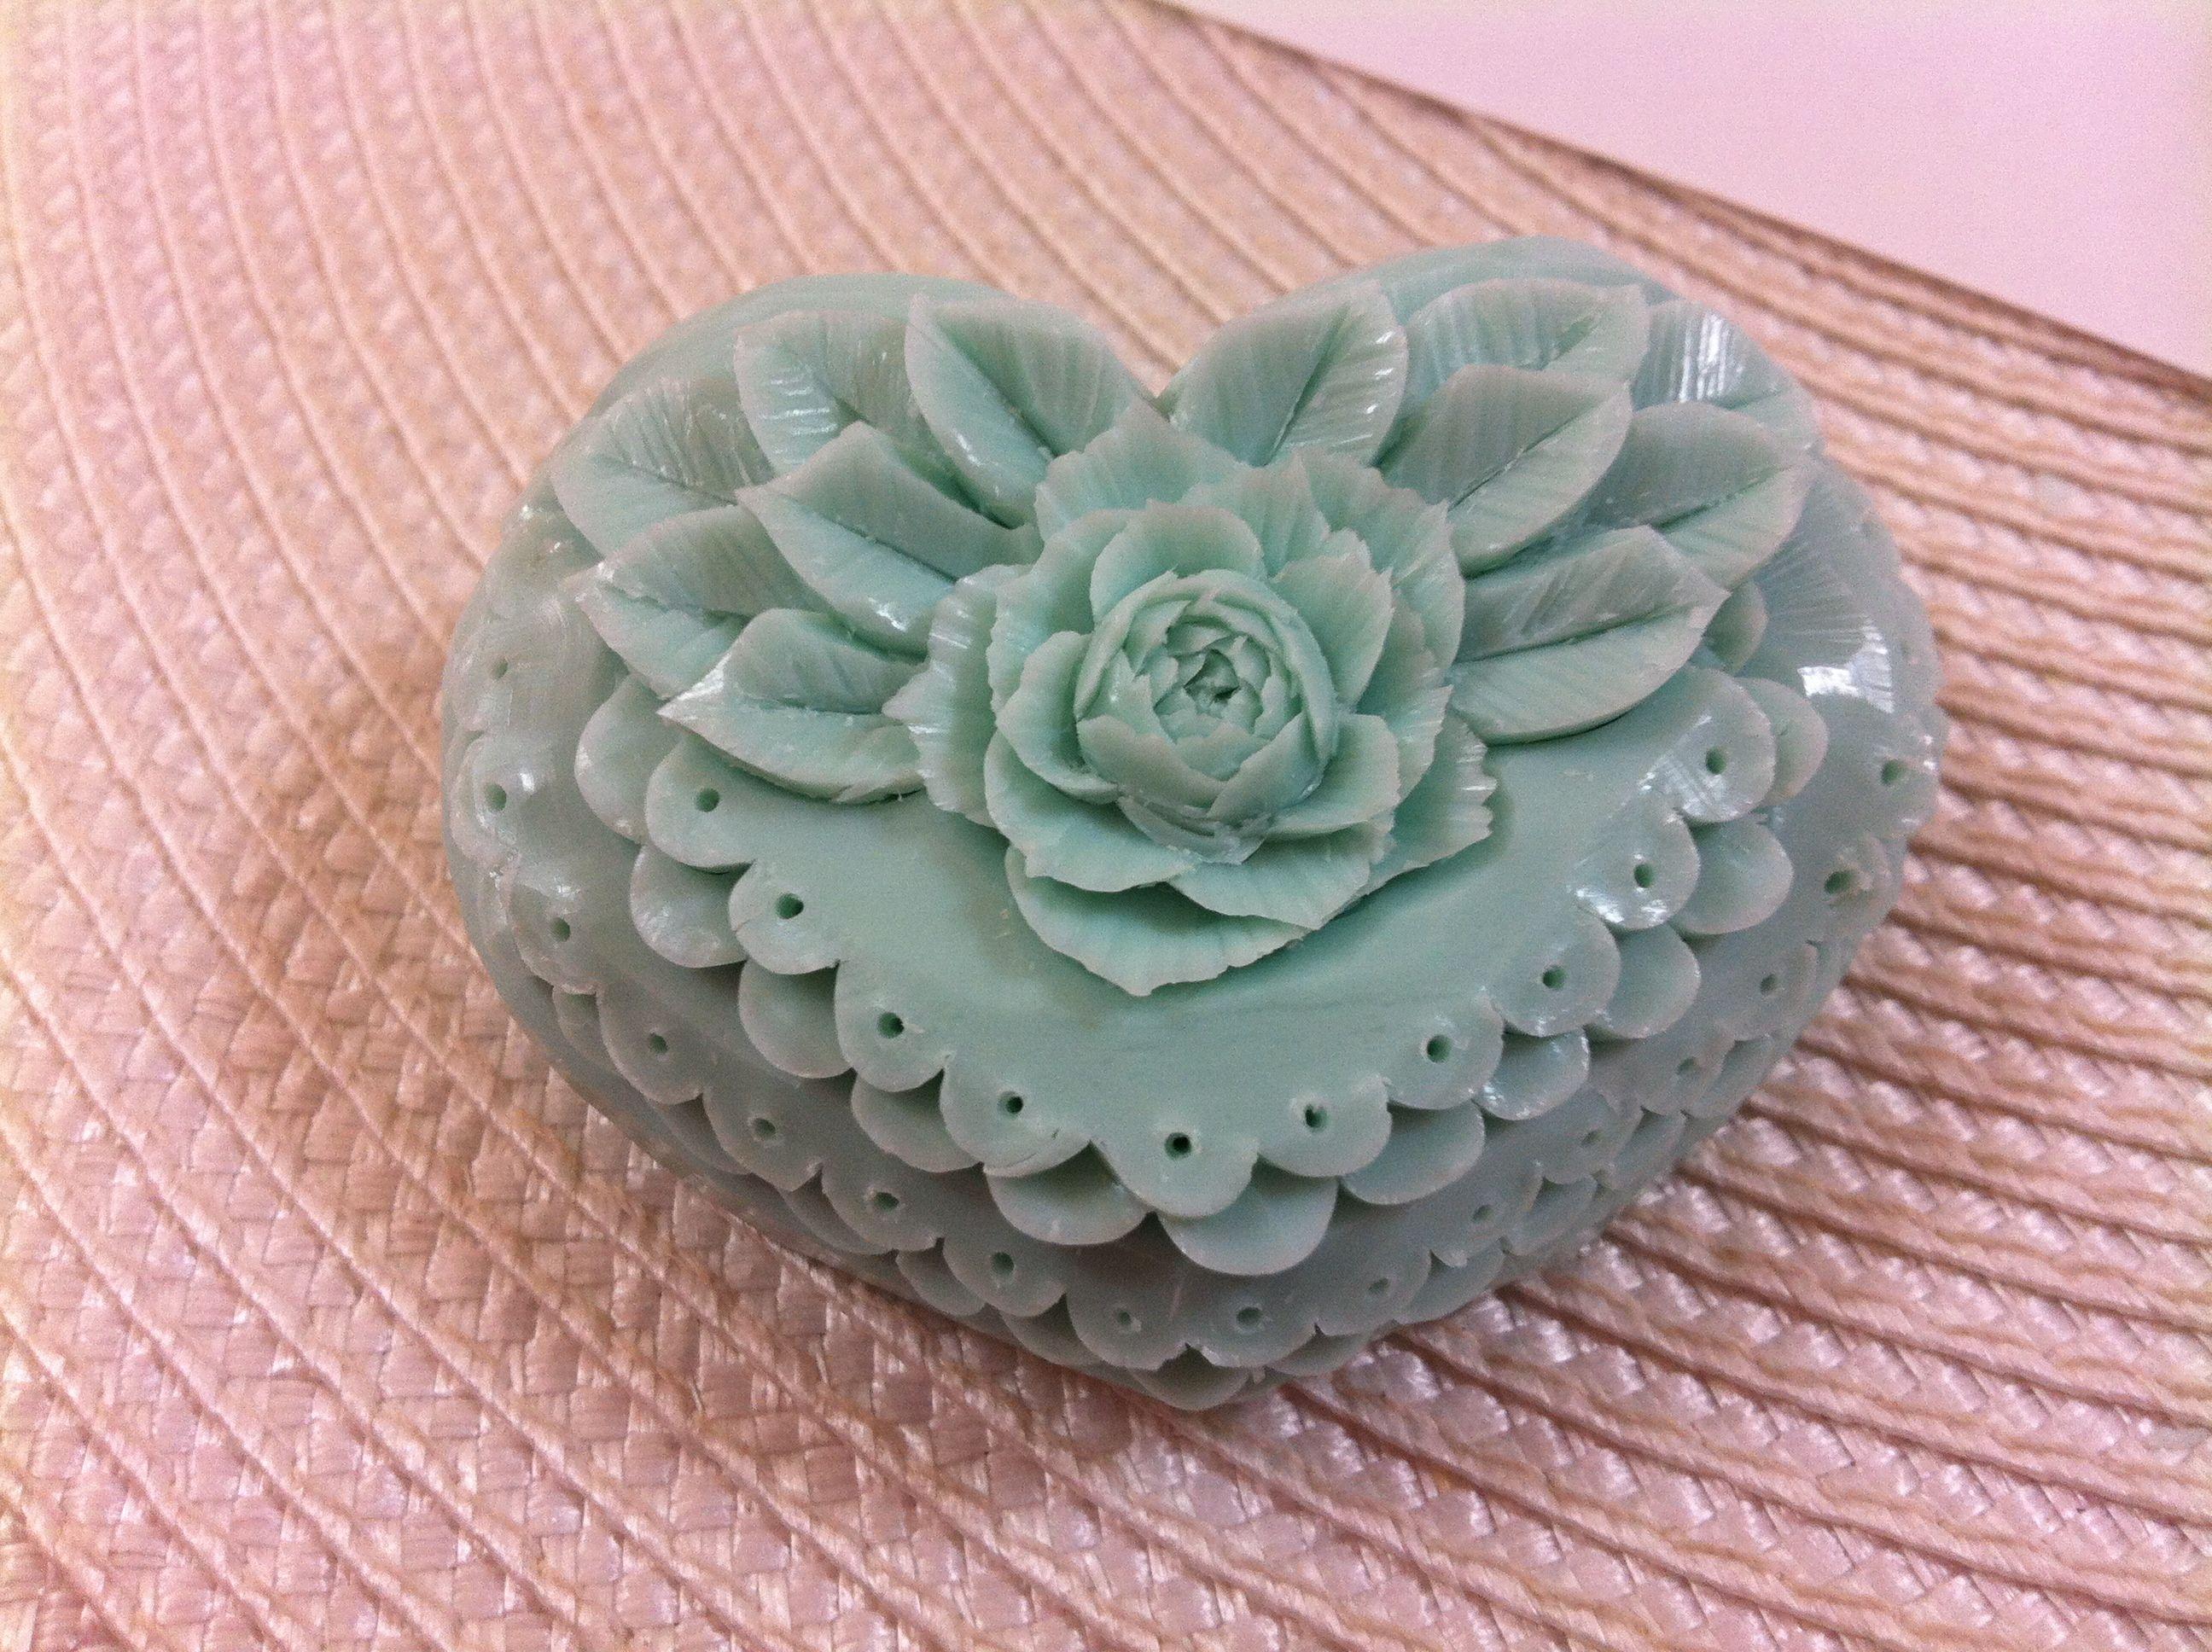 Soap carving fun pinterest